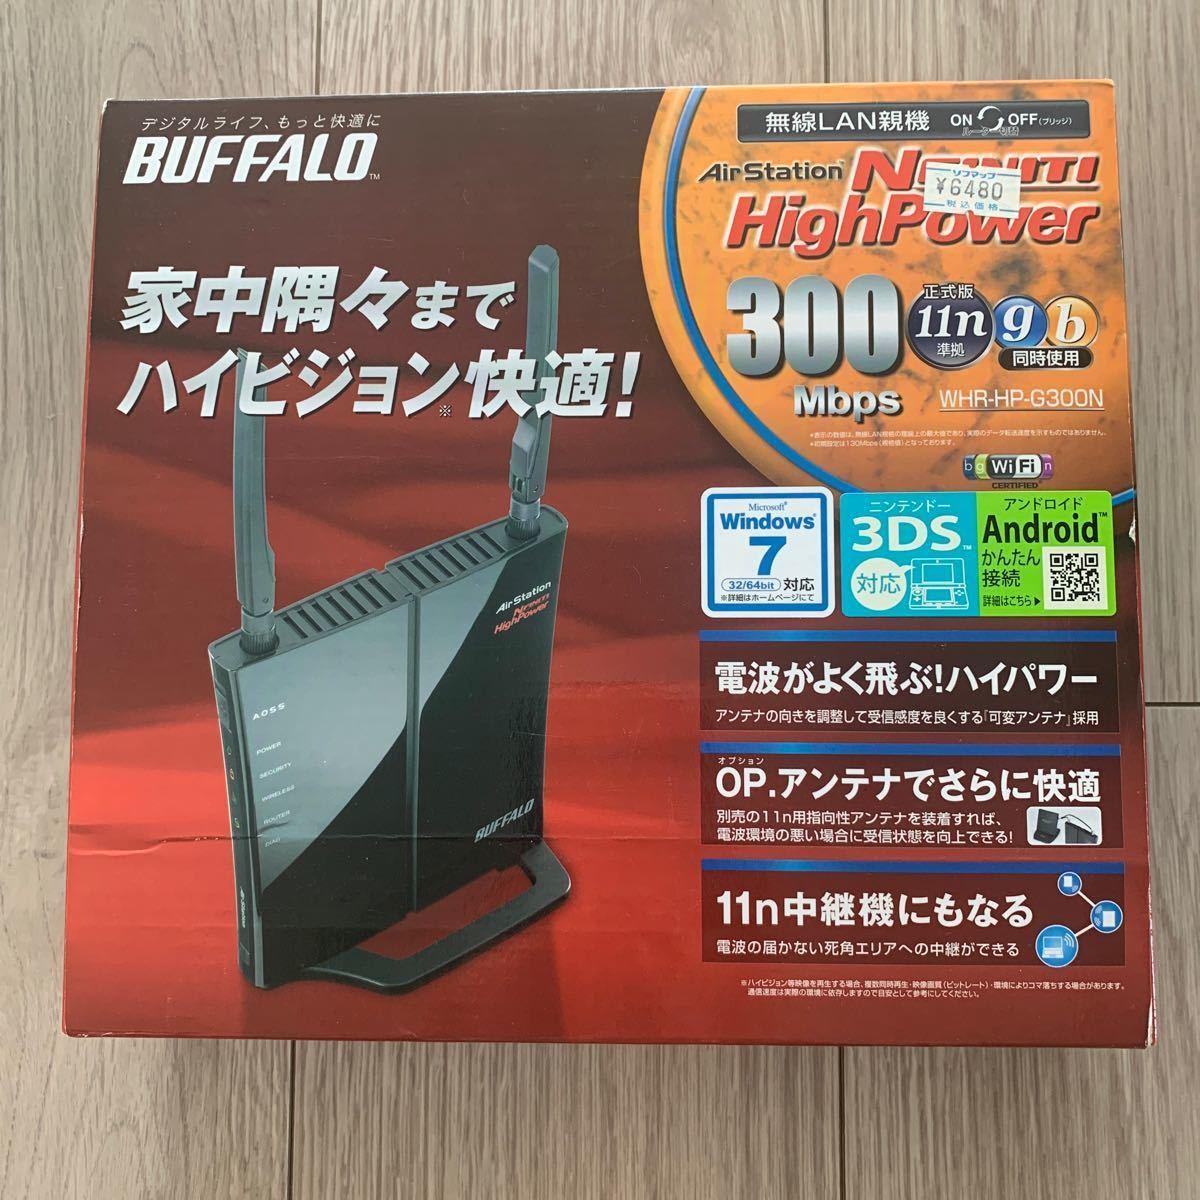 BUFFALO 無線LAN親機 WHR-HP-G300N